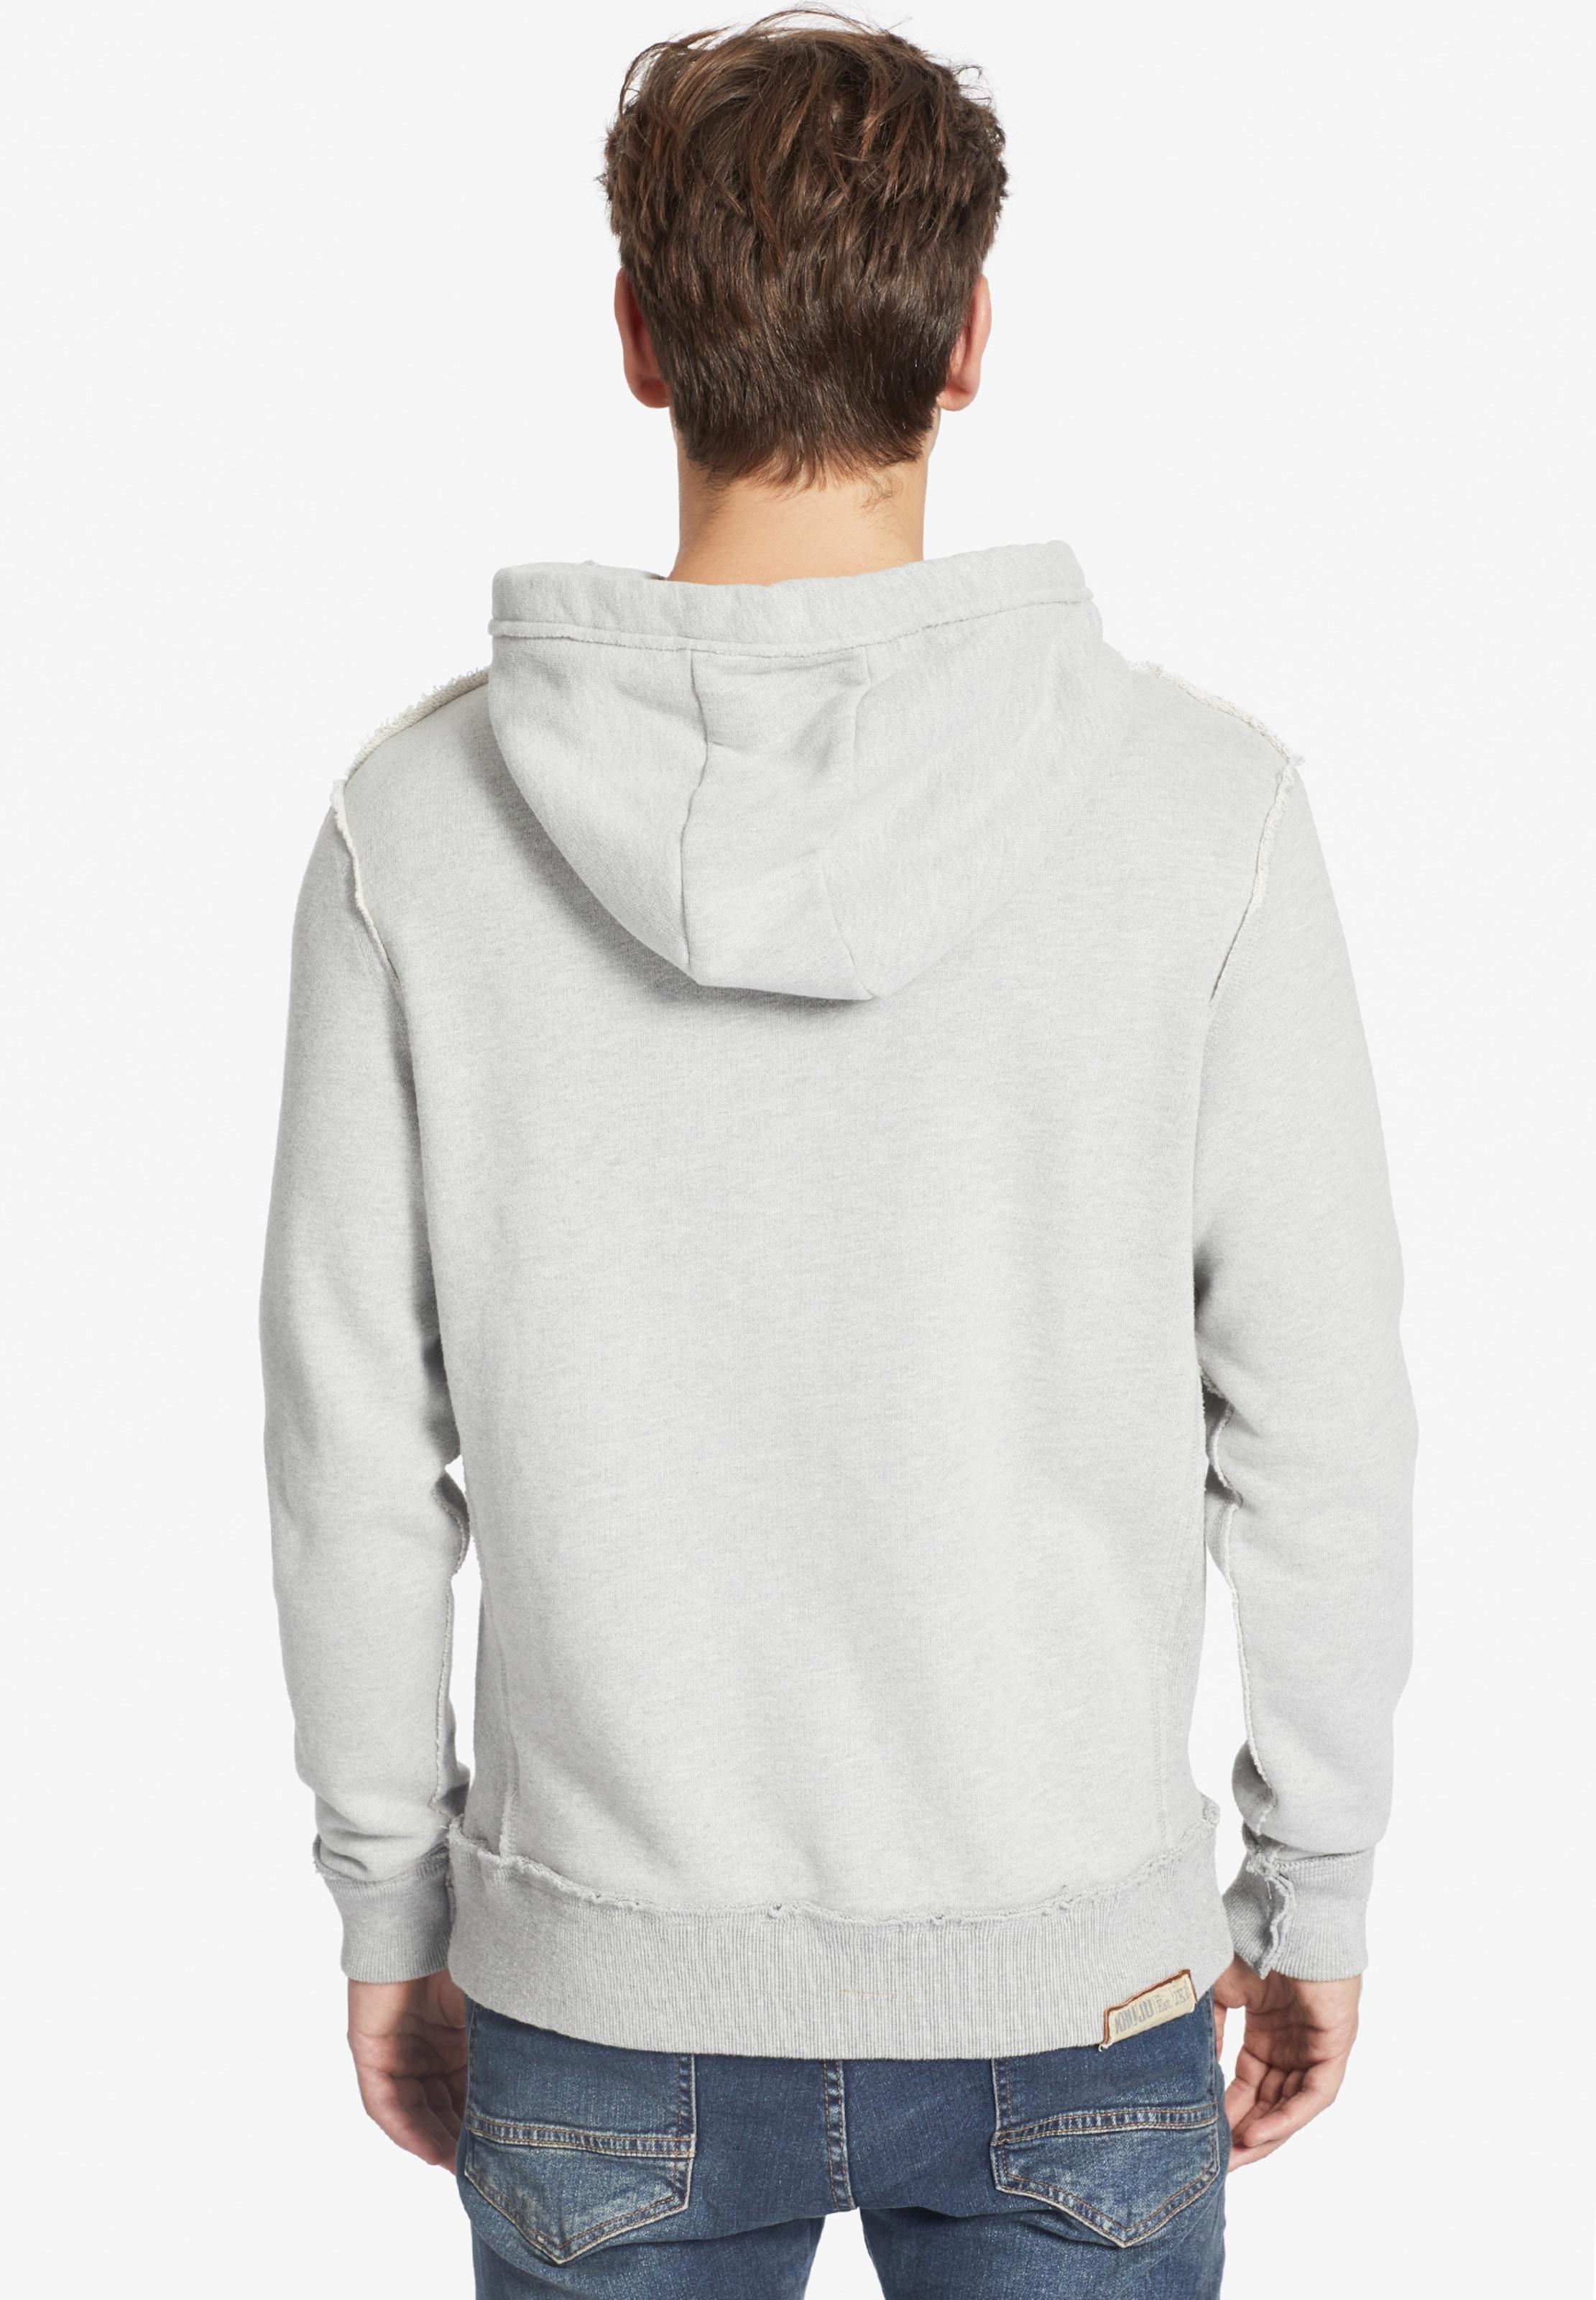 GoldgelbGrau 'simo' Khujo Weiß Sweatshirt In SzMqVpU